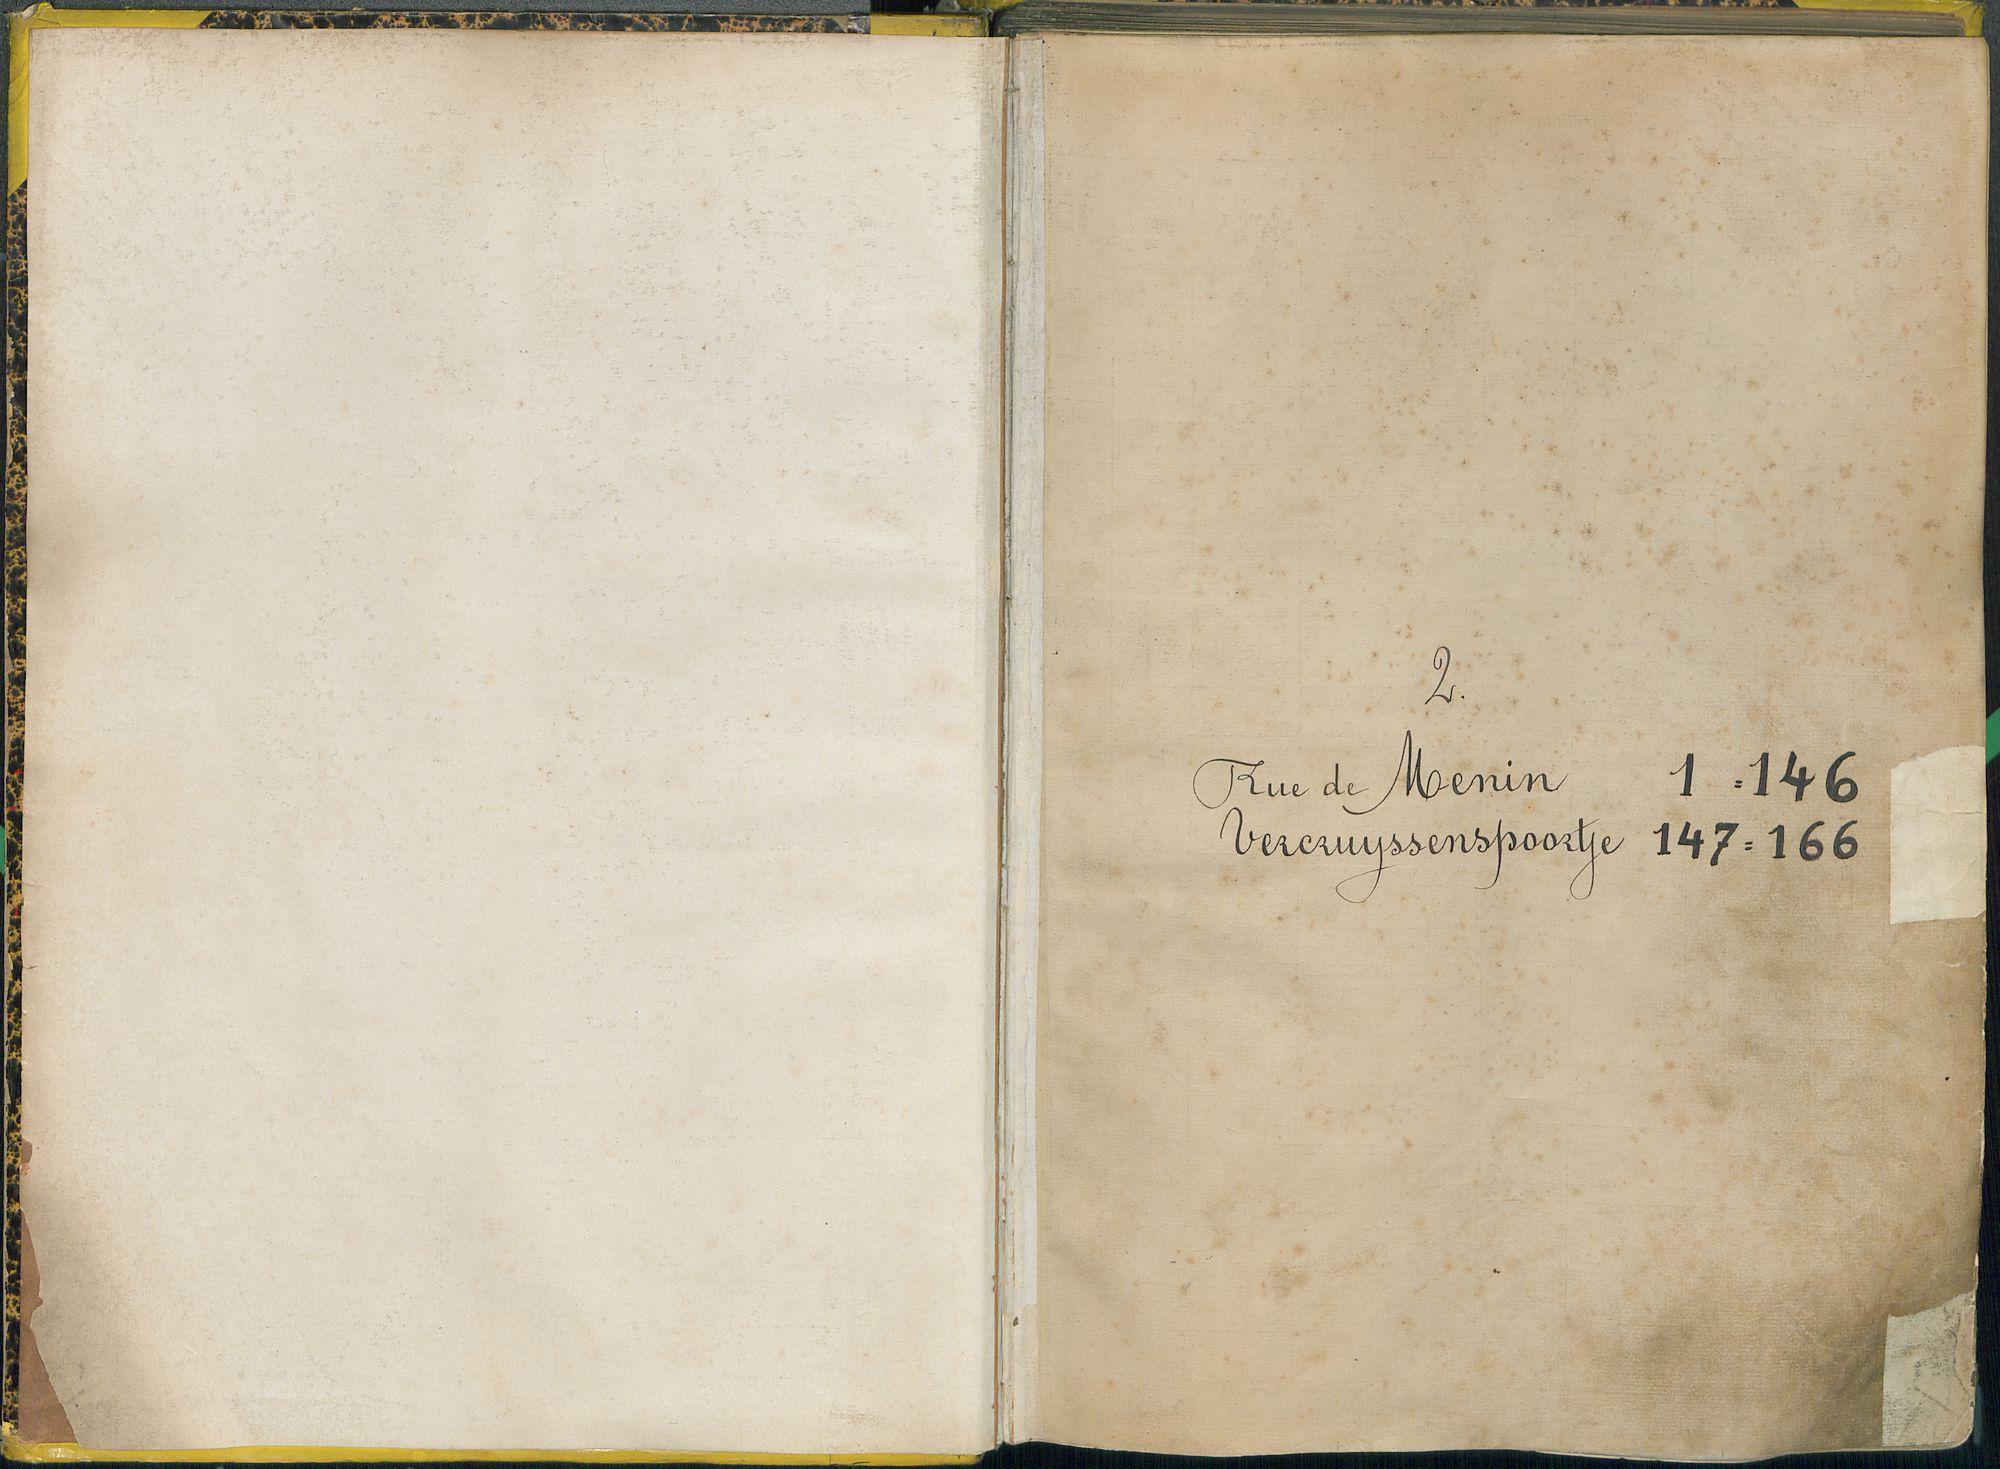 Bevolkingsregister Kortrijk 1890 boek 2